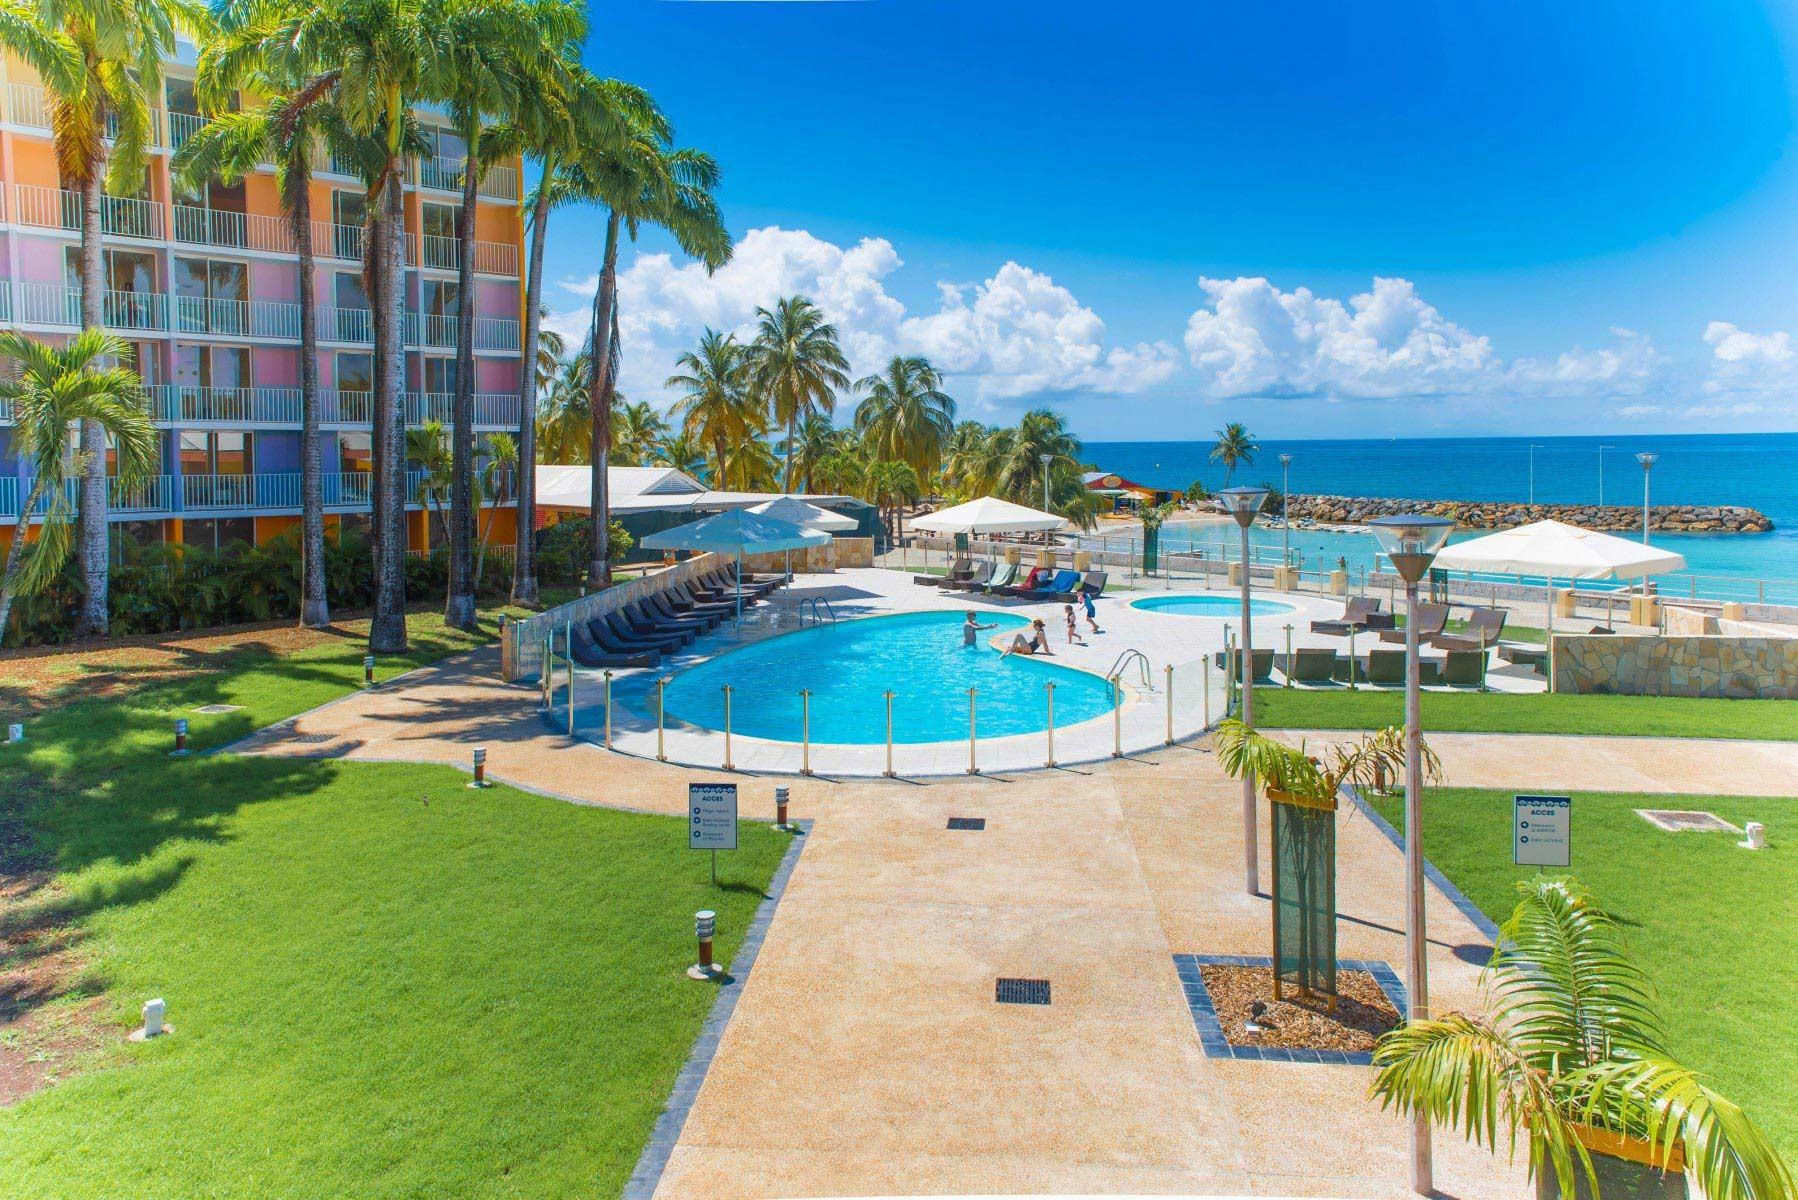 Karibea Beach Resort Hotels Au Gosier En Guadeloupe Hotels Karibea